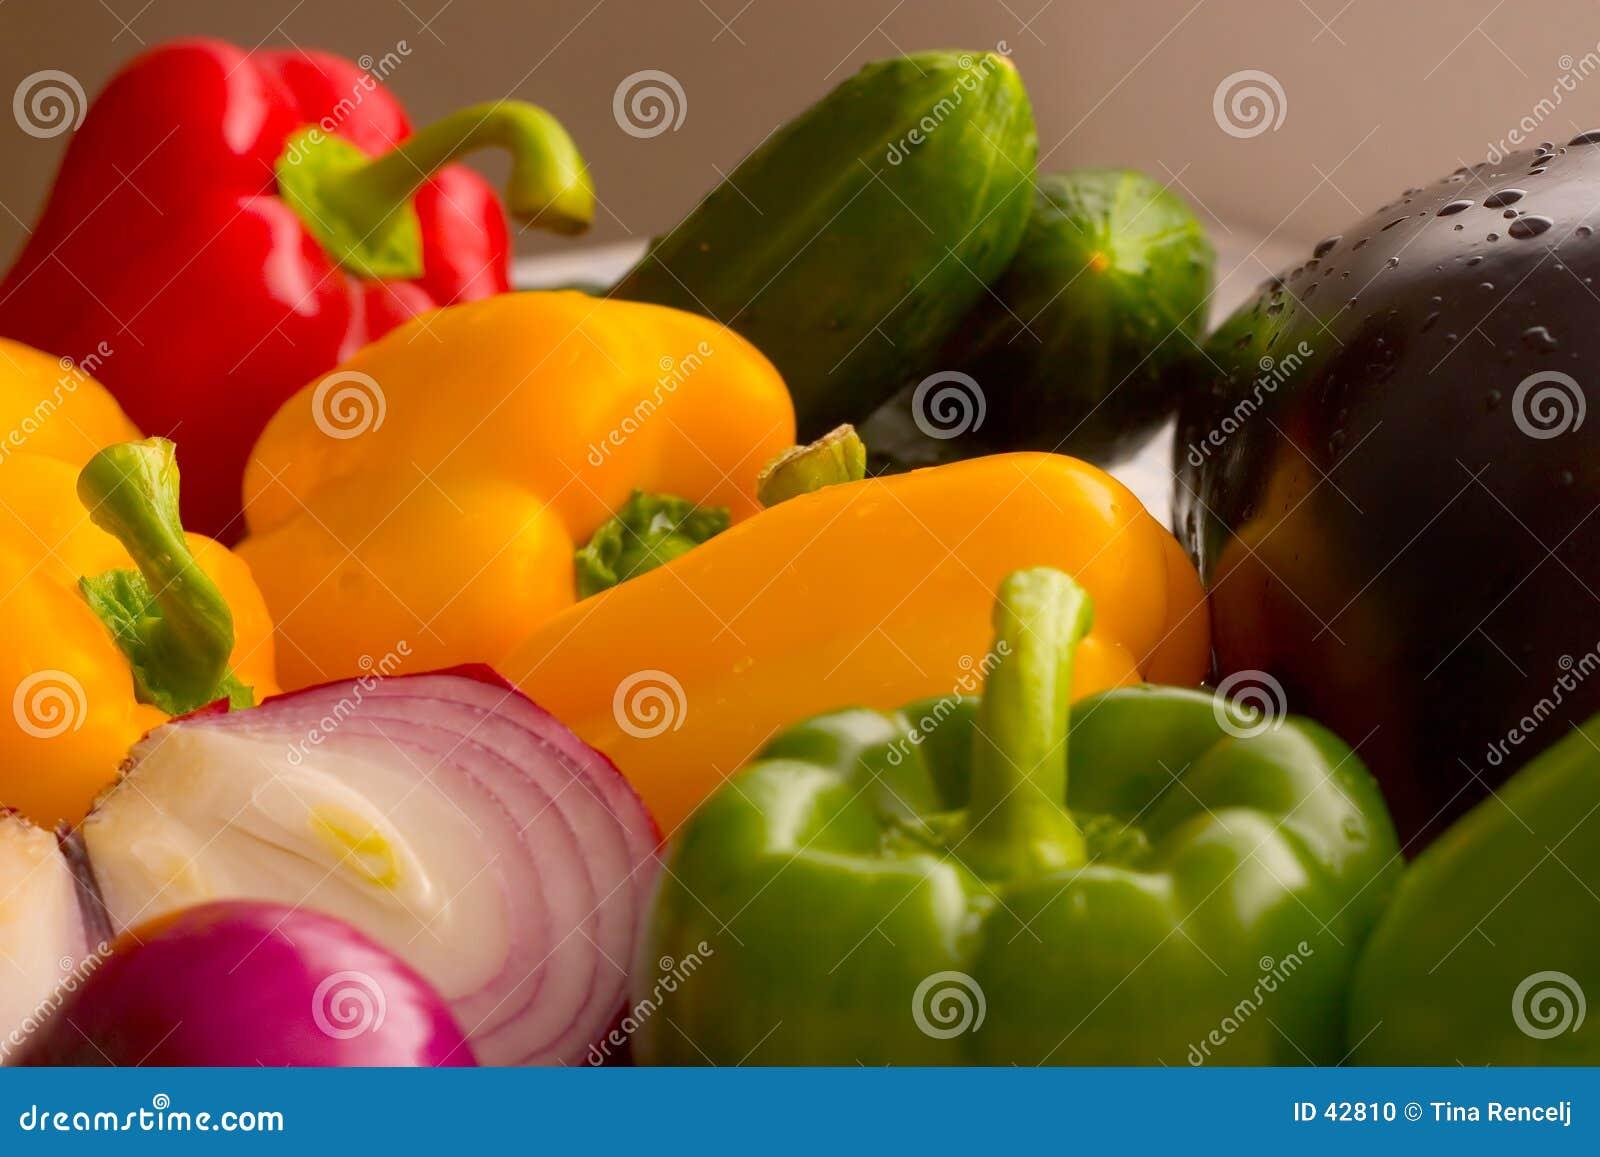 Download Verduras frescas II foto de archivo. Imagen de gotas, detalles - 42810